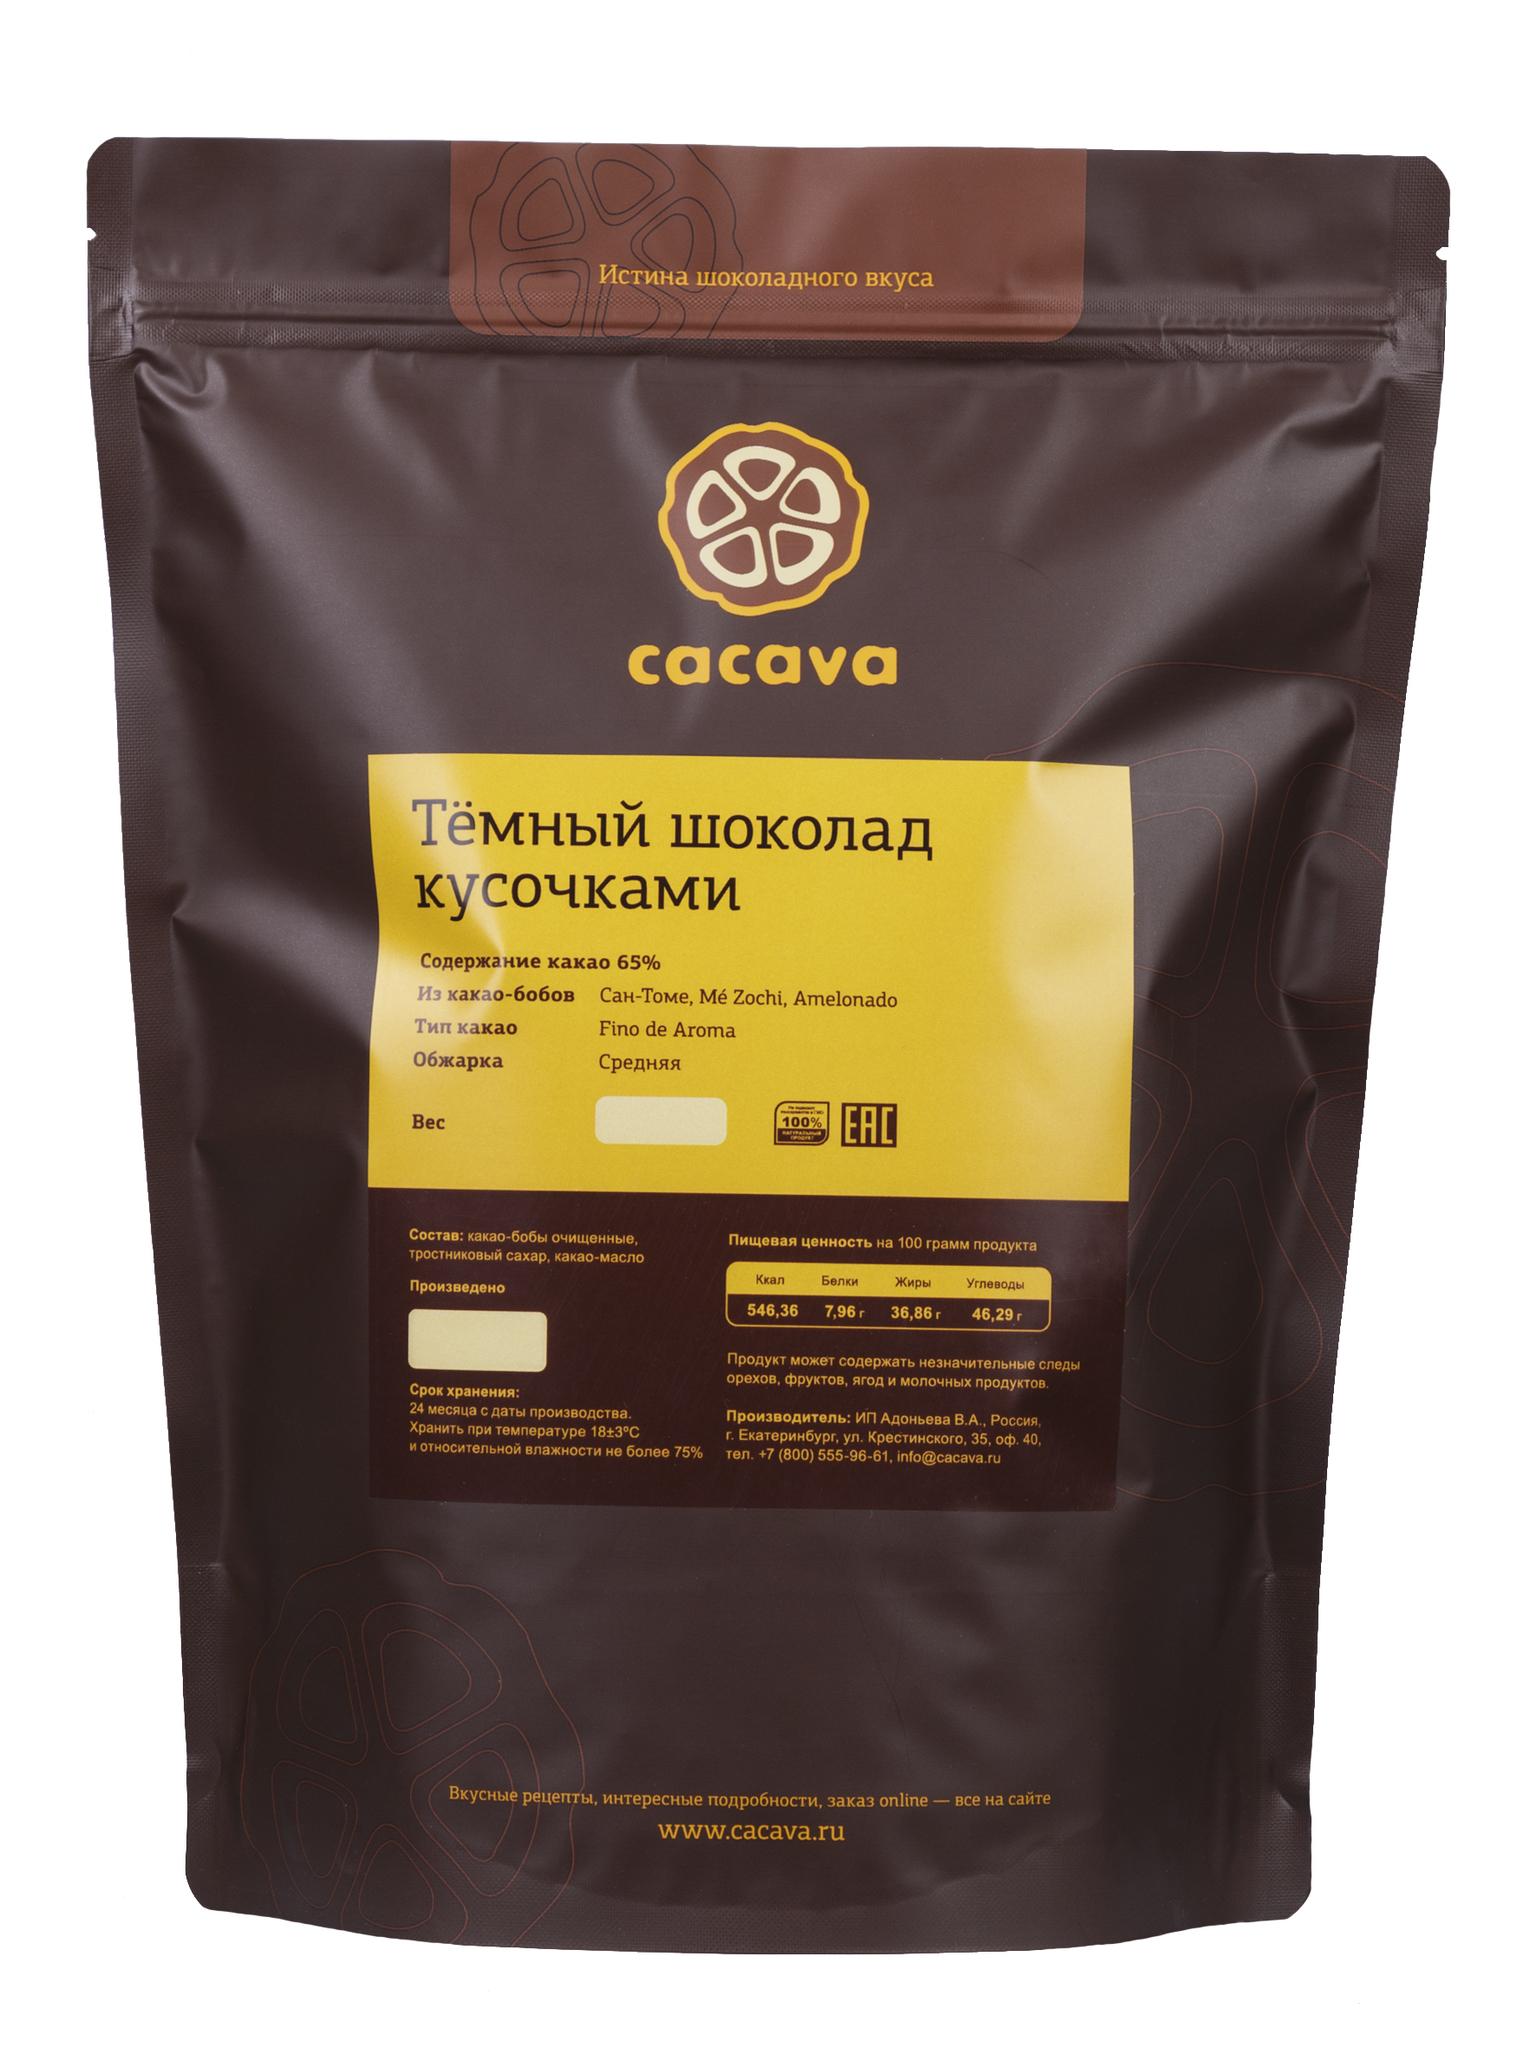 Тёмный шоколад 65 % какао (Сан-Томе), упаковка 1 кг